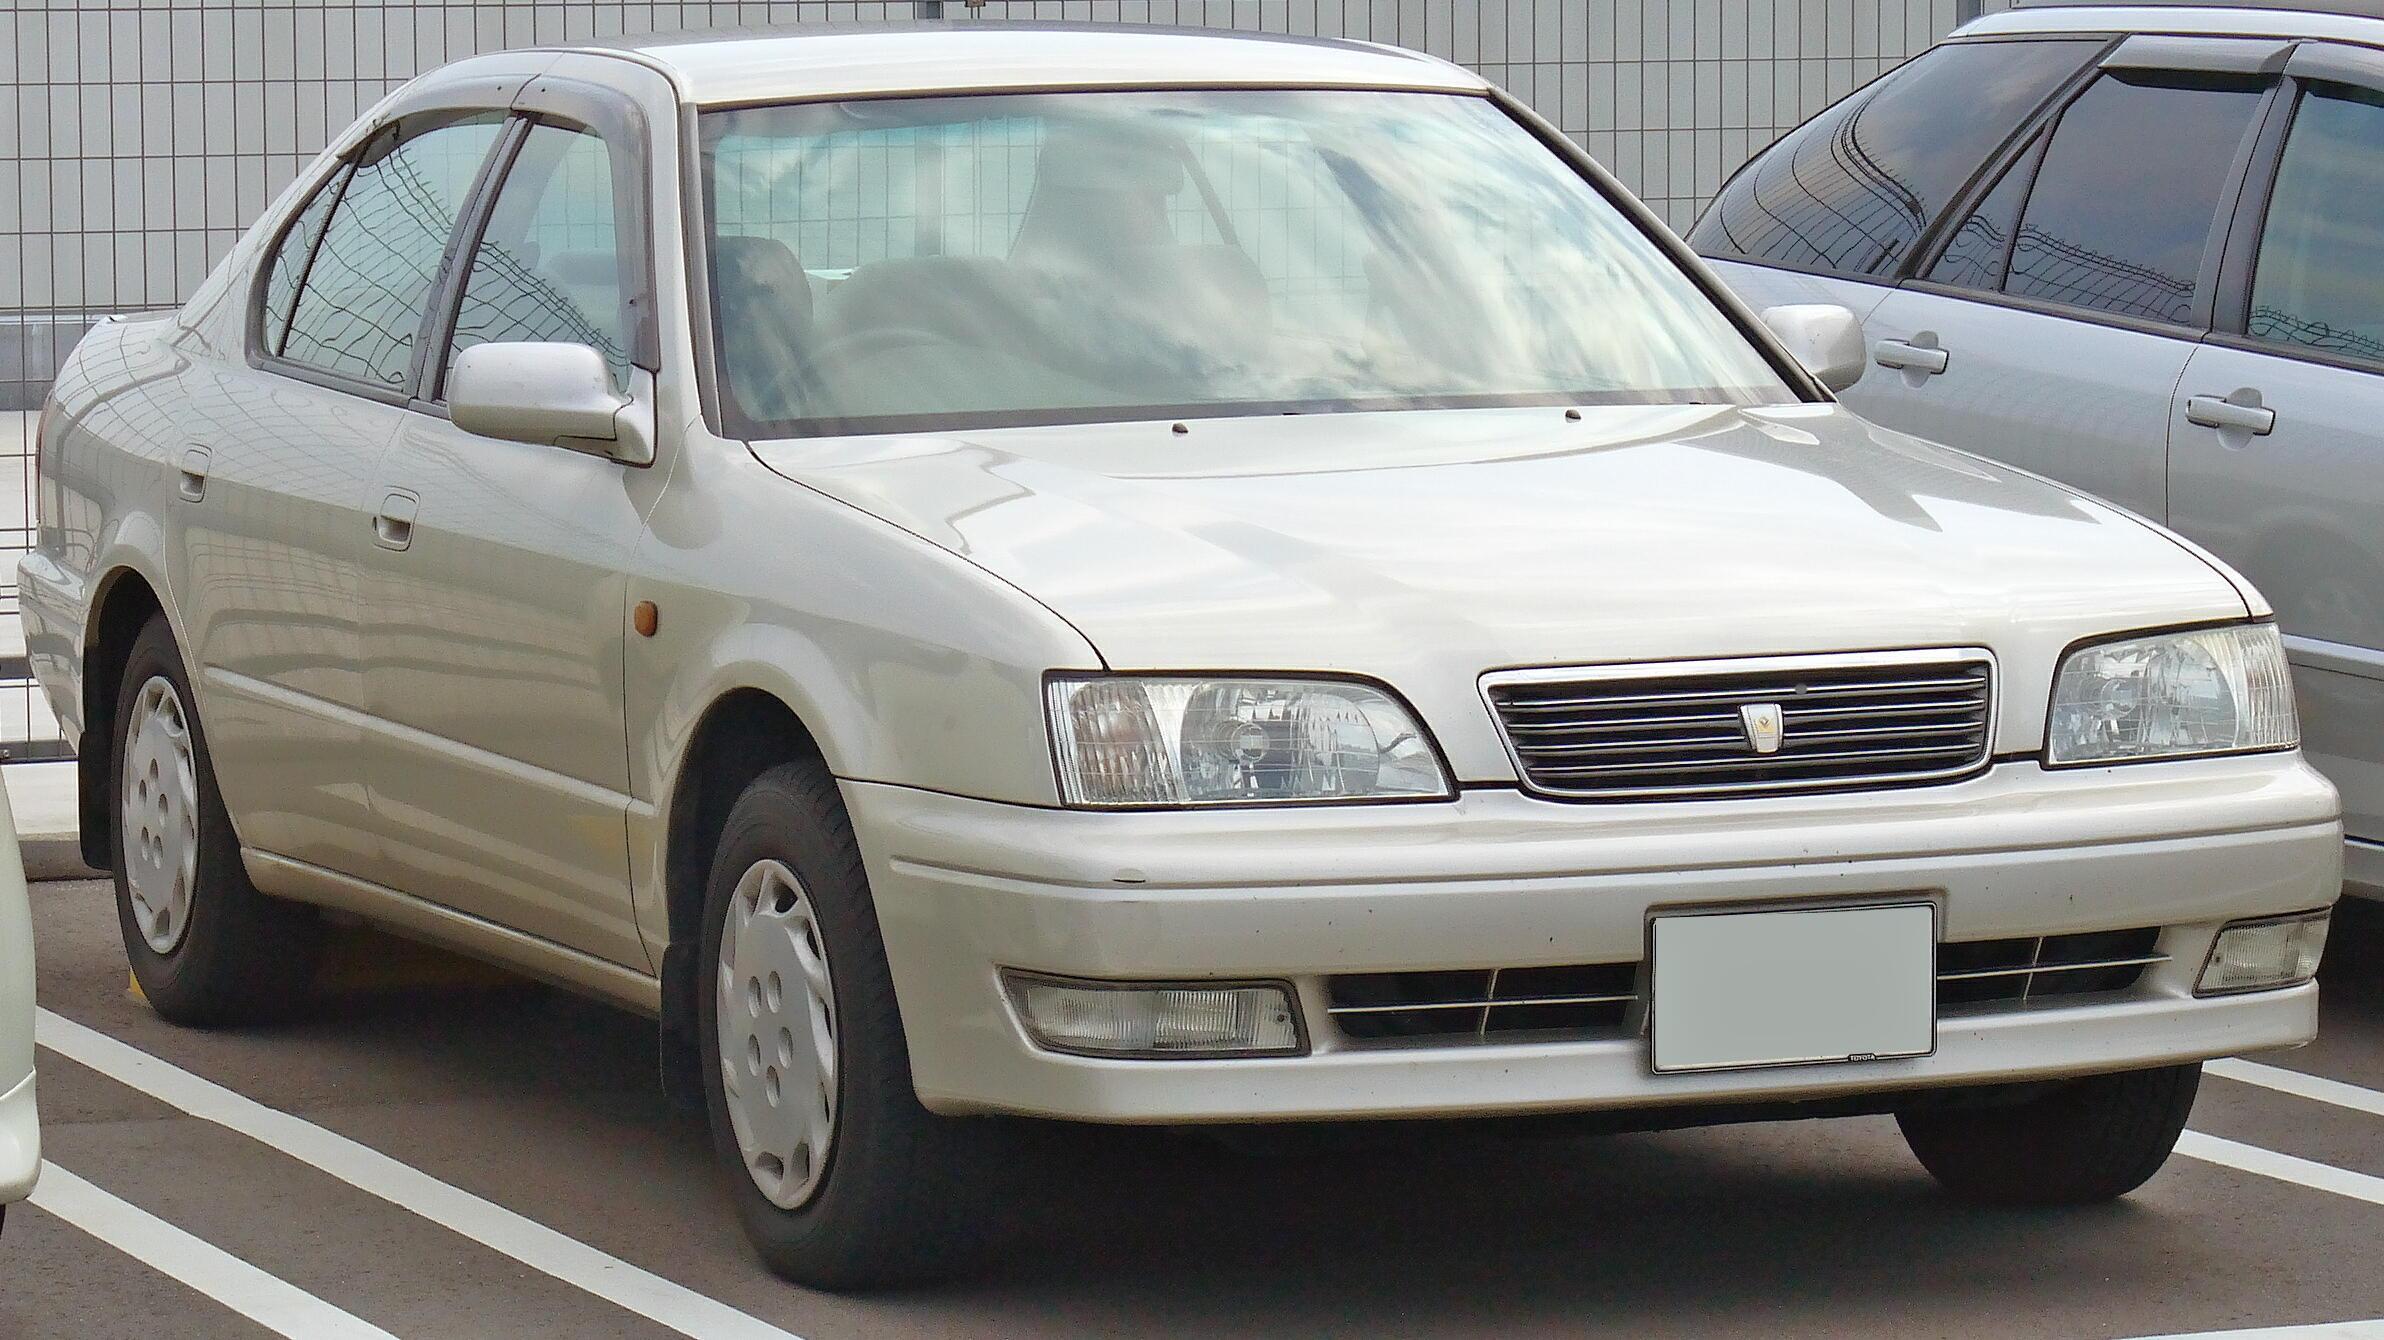 Toyota Vista III (V30) 1990 - 1994 Sedan-Hardtop #4